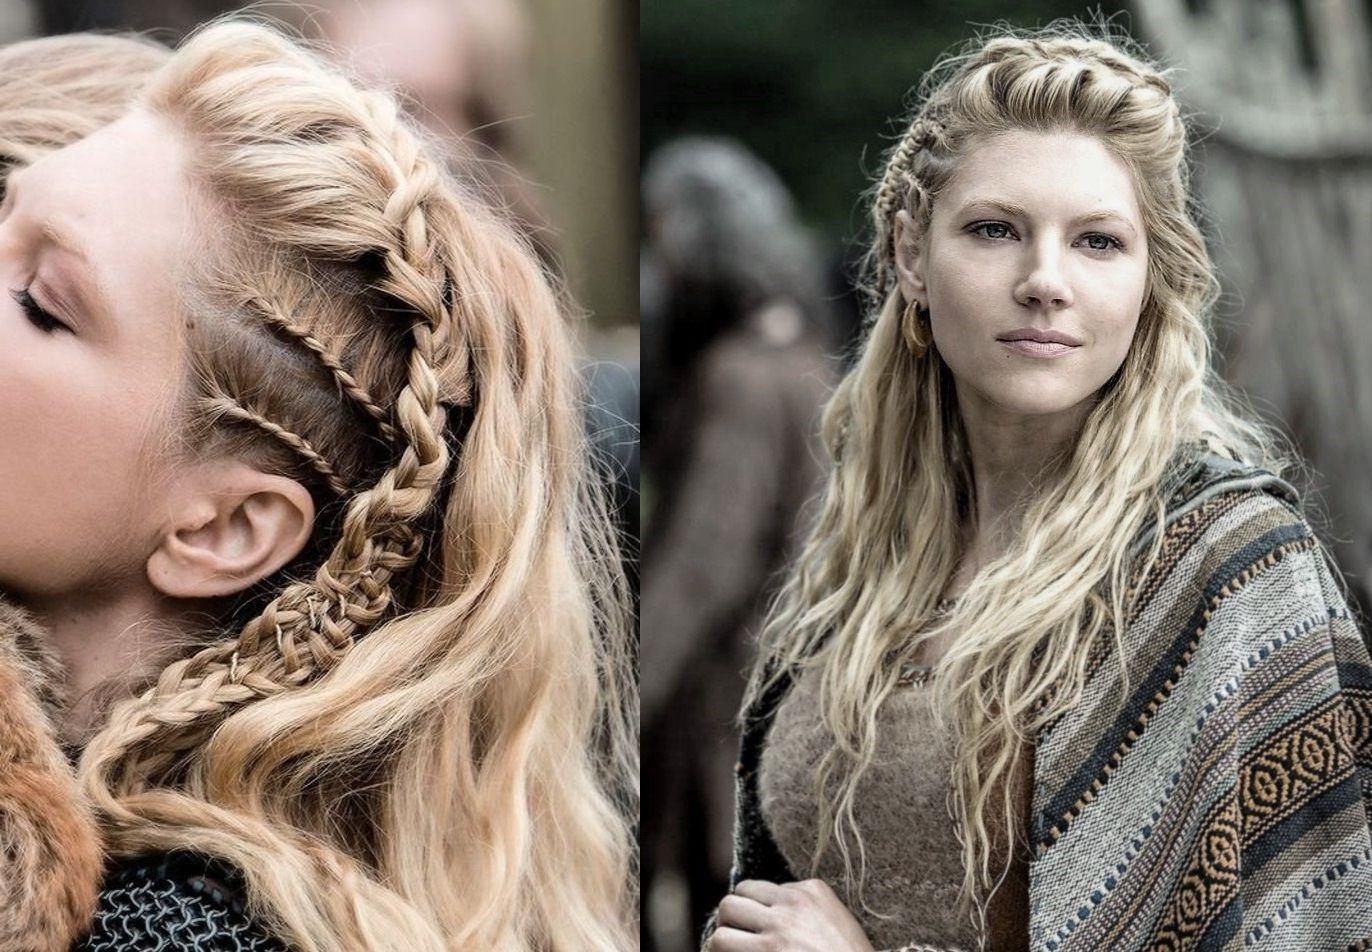 Lagertha Vikings Viking Hair Blonde Braids Hair Styling Viking Norse Freya Freyja Mythology Lothbrok Viking Hair Viking Braids Hair Styles